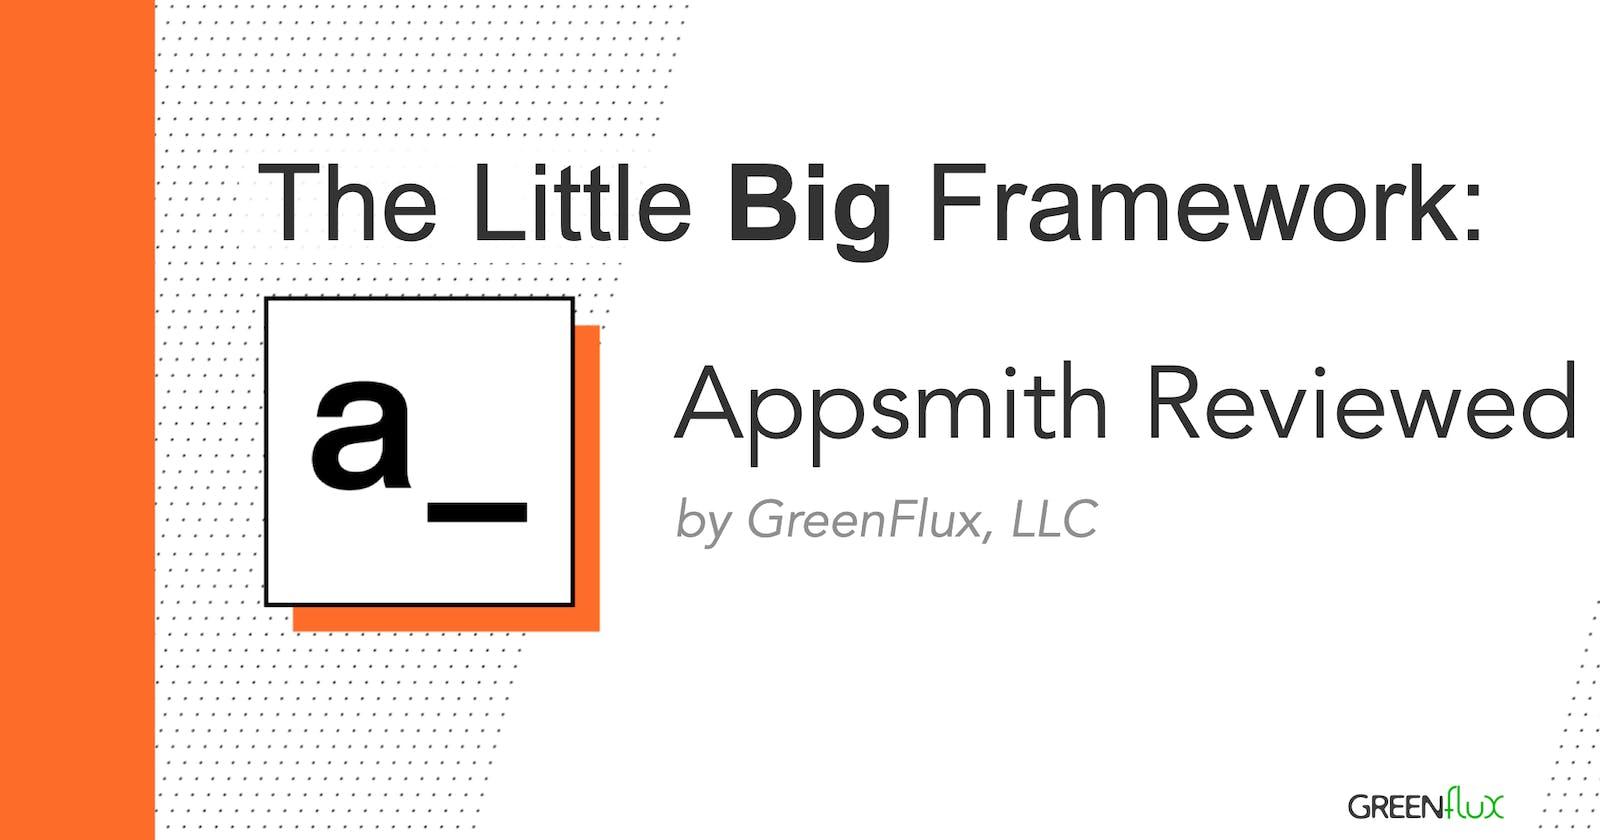 The Little Big Framework: Appsmith Reviewed